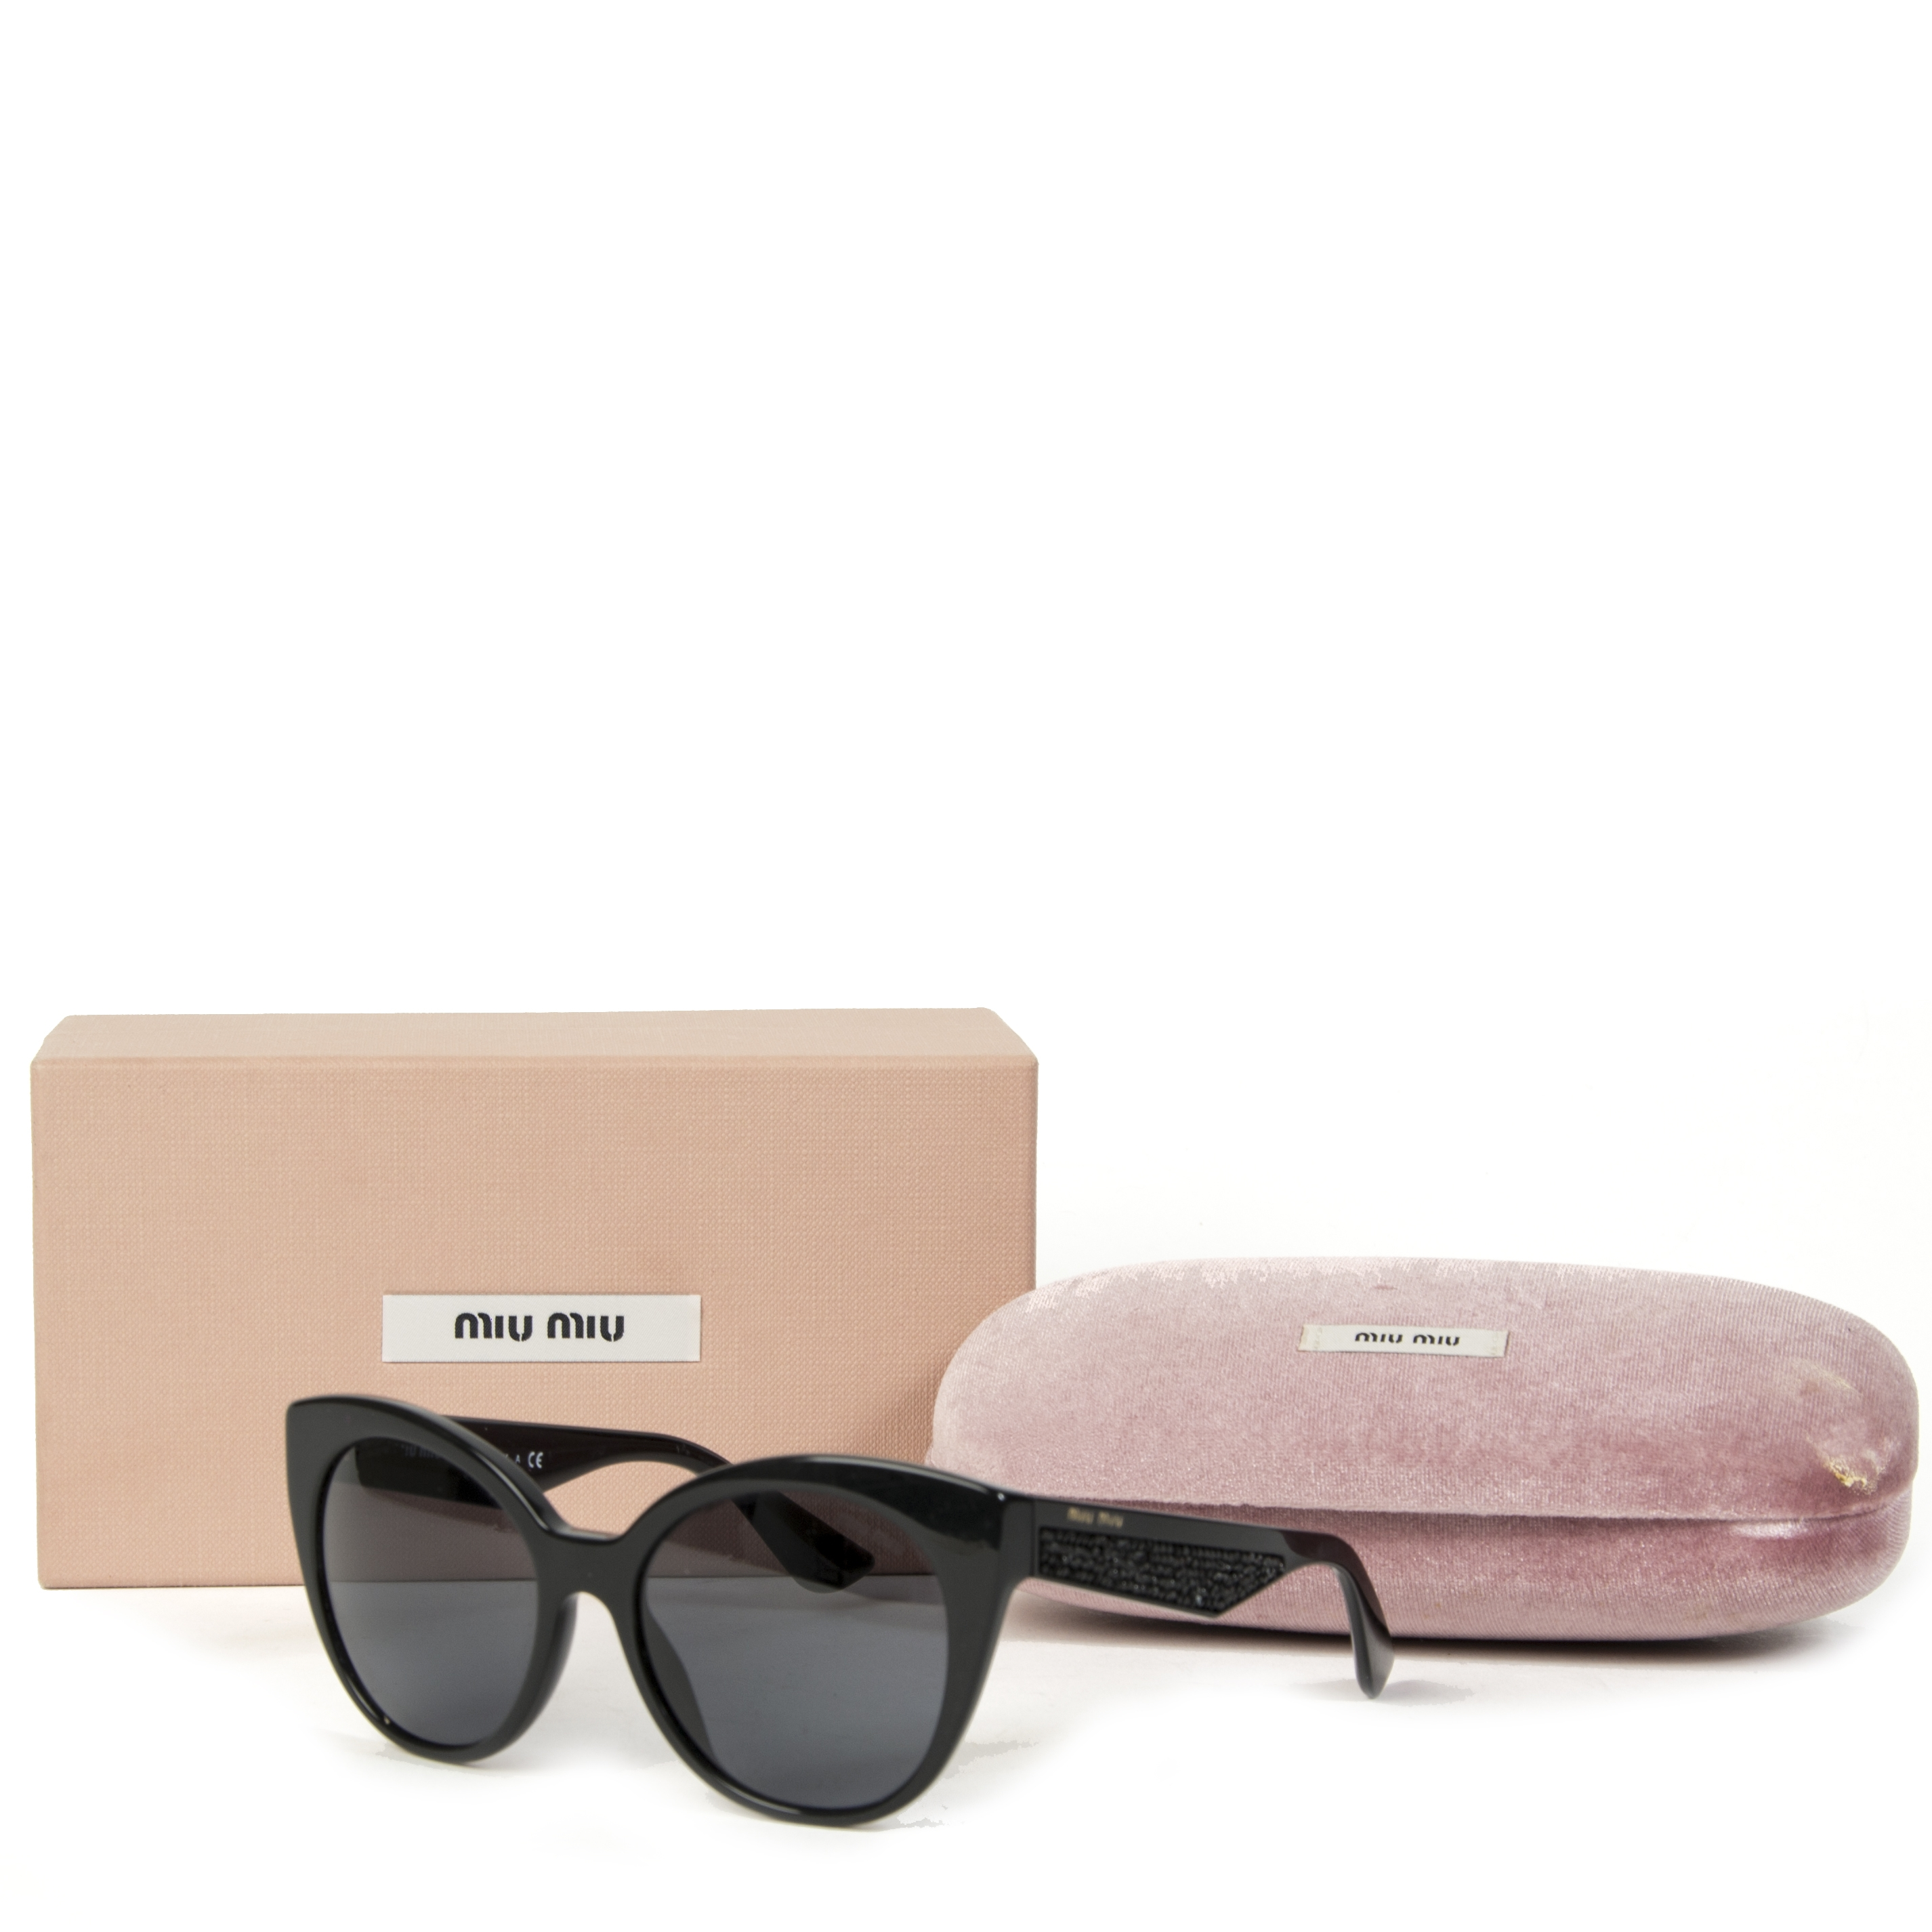 Miu Miu Cateye Crystal Sunglasses